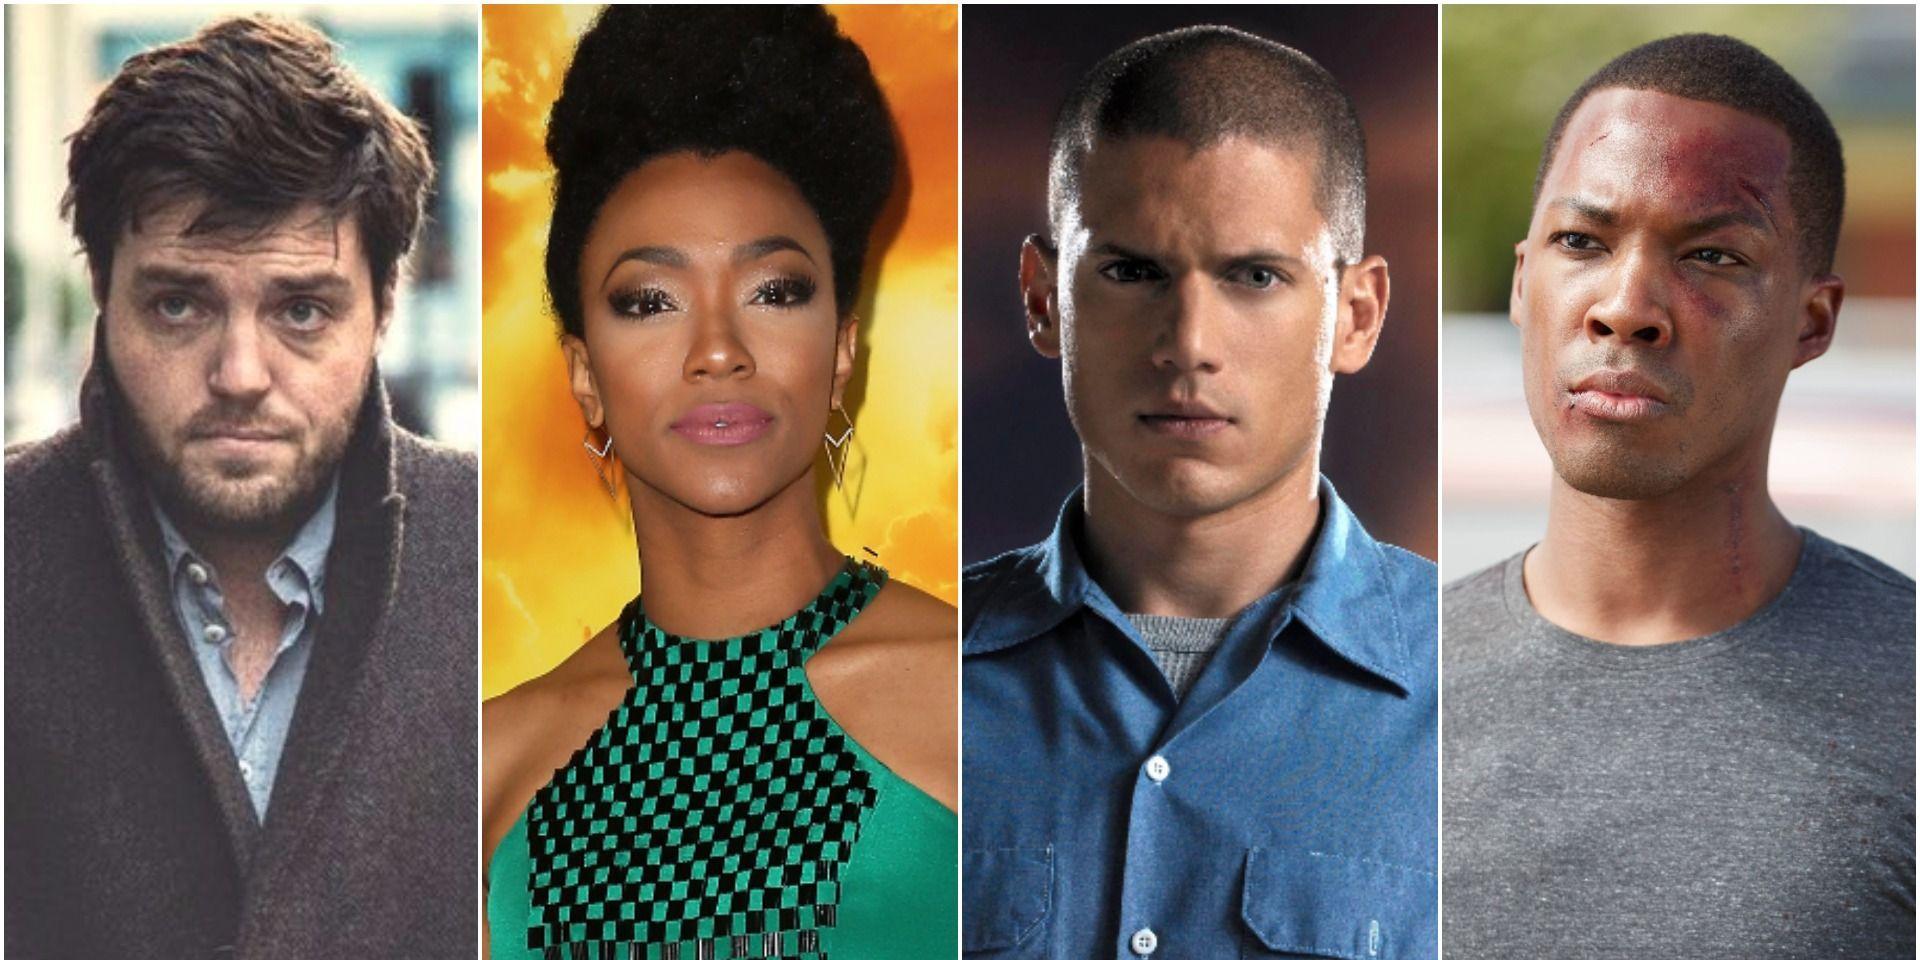 2017 shows: Cormoran Strike, Star Trek: Discovery, Prison Break, 24: Legacy